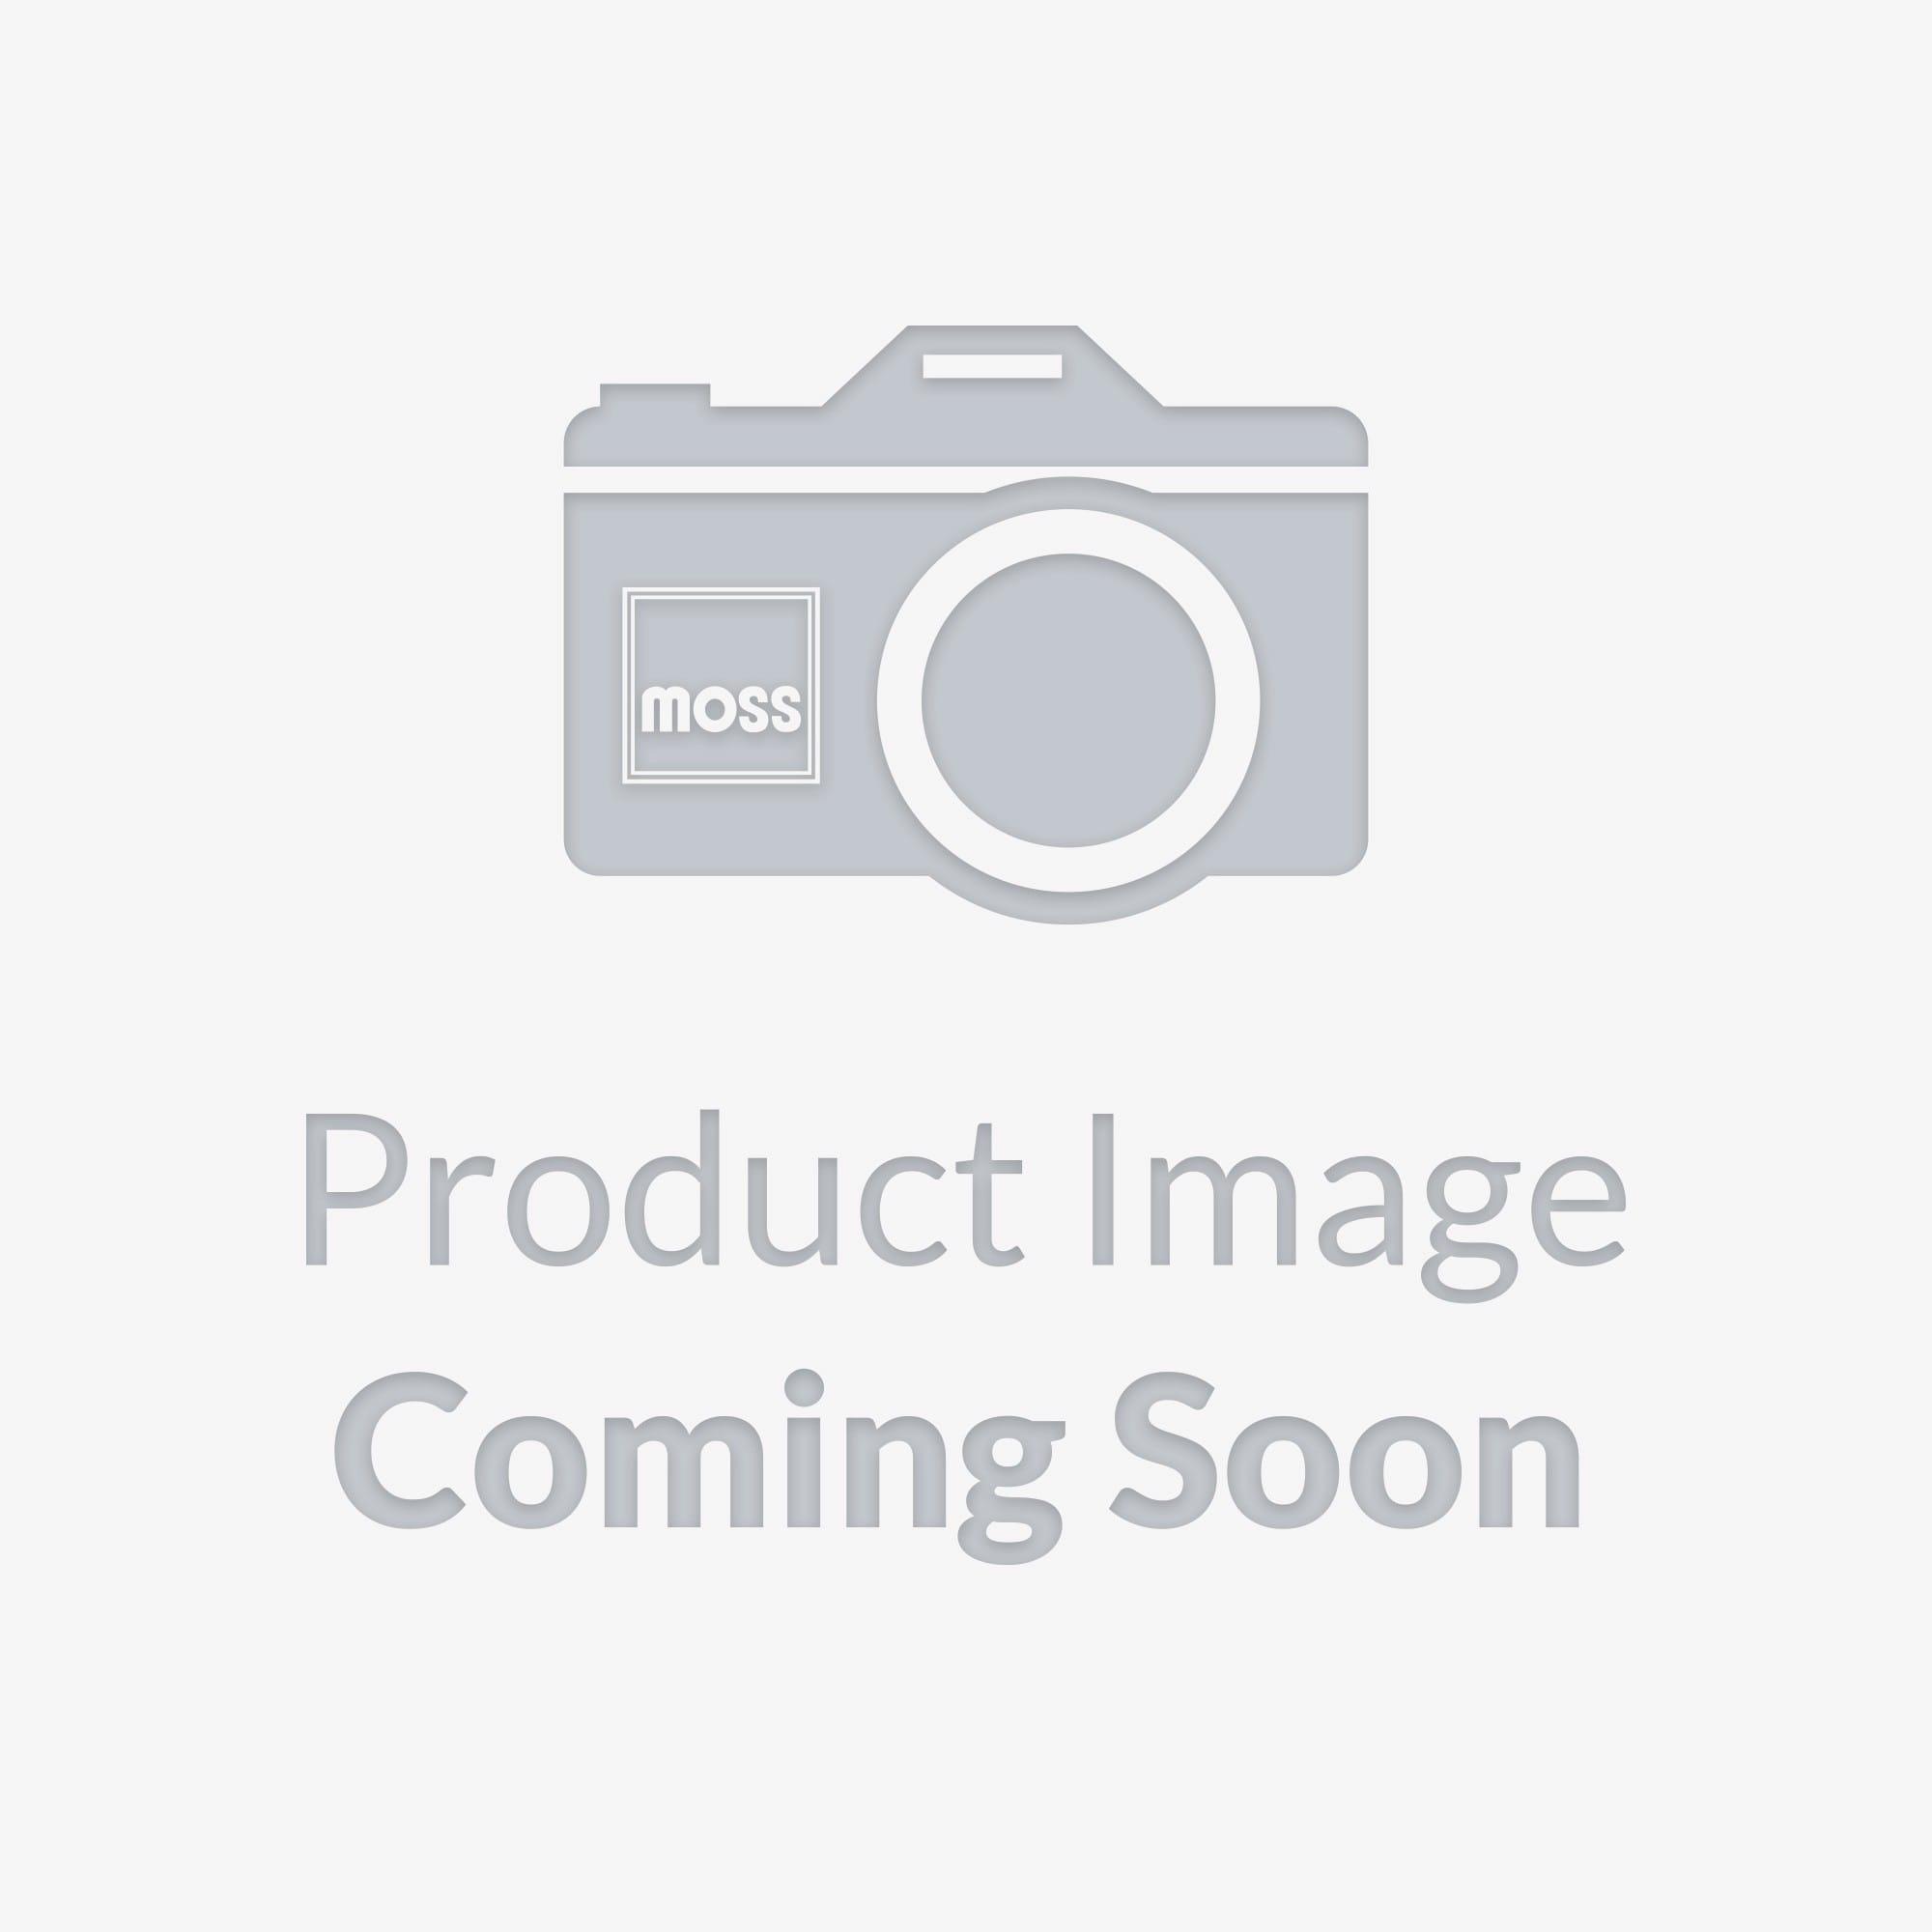 Velour Seat Covers Interior 1999 2005 Mx 5 Miata Mossmiata